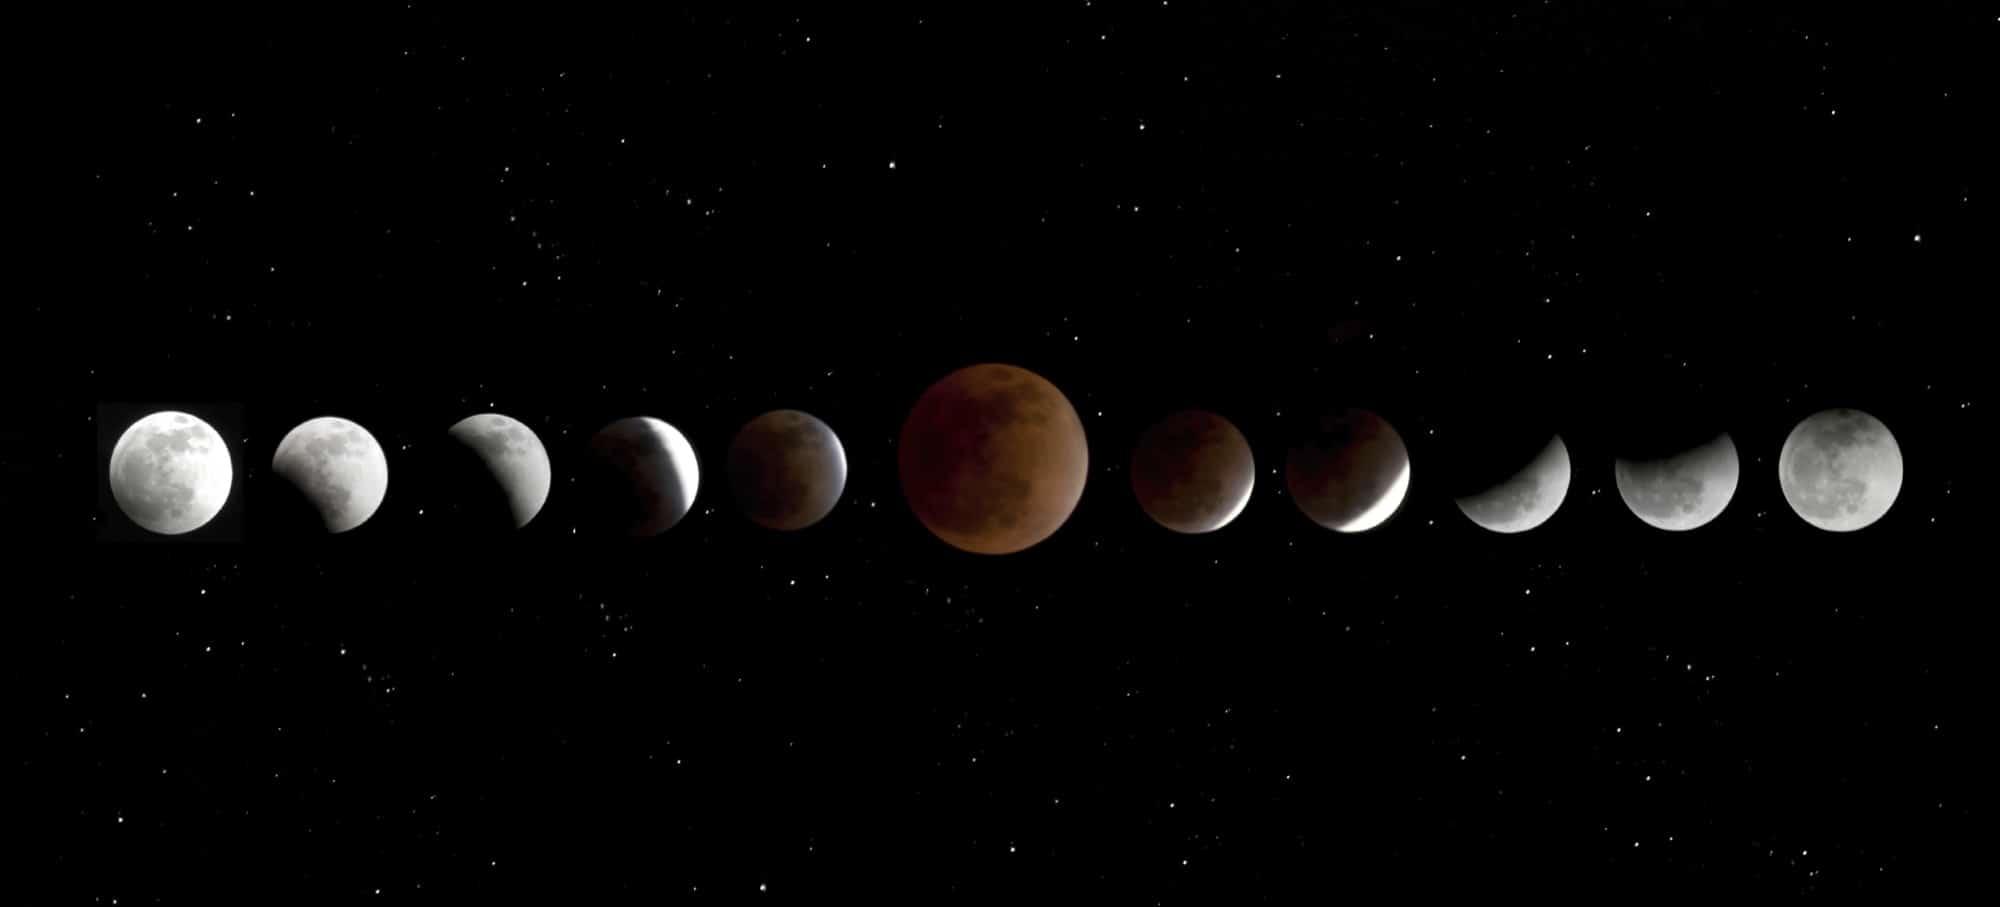 red moon 2019 calendar - photo #13